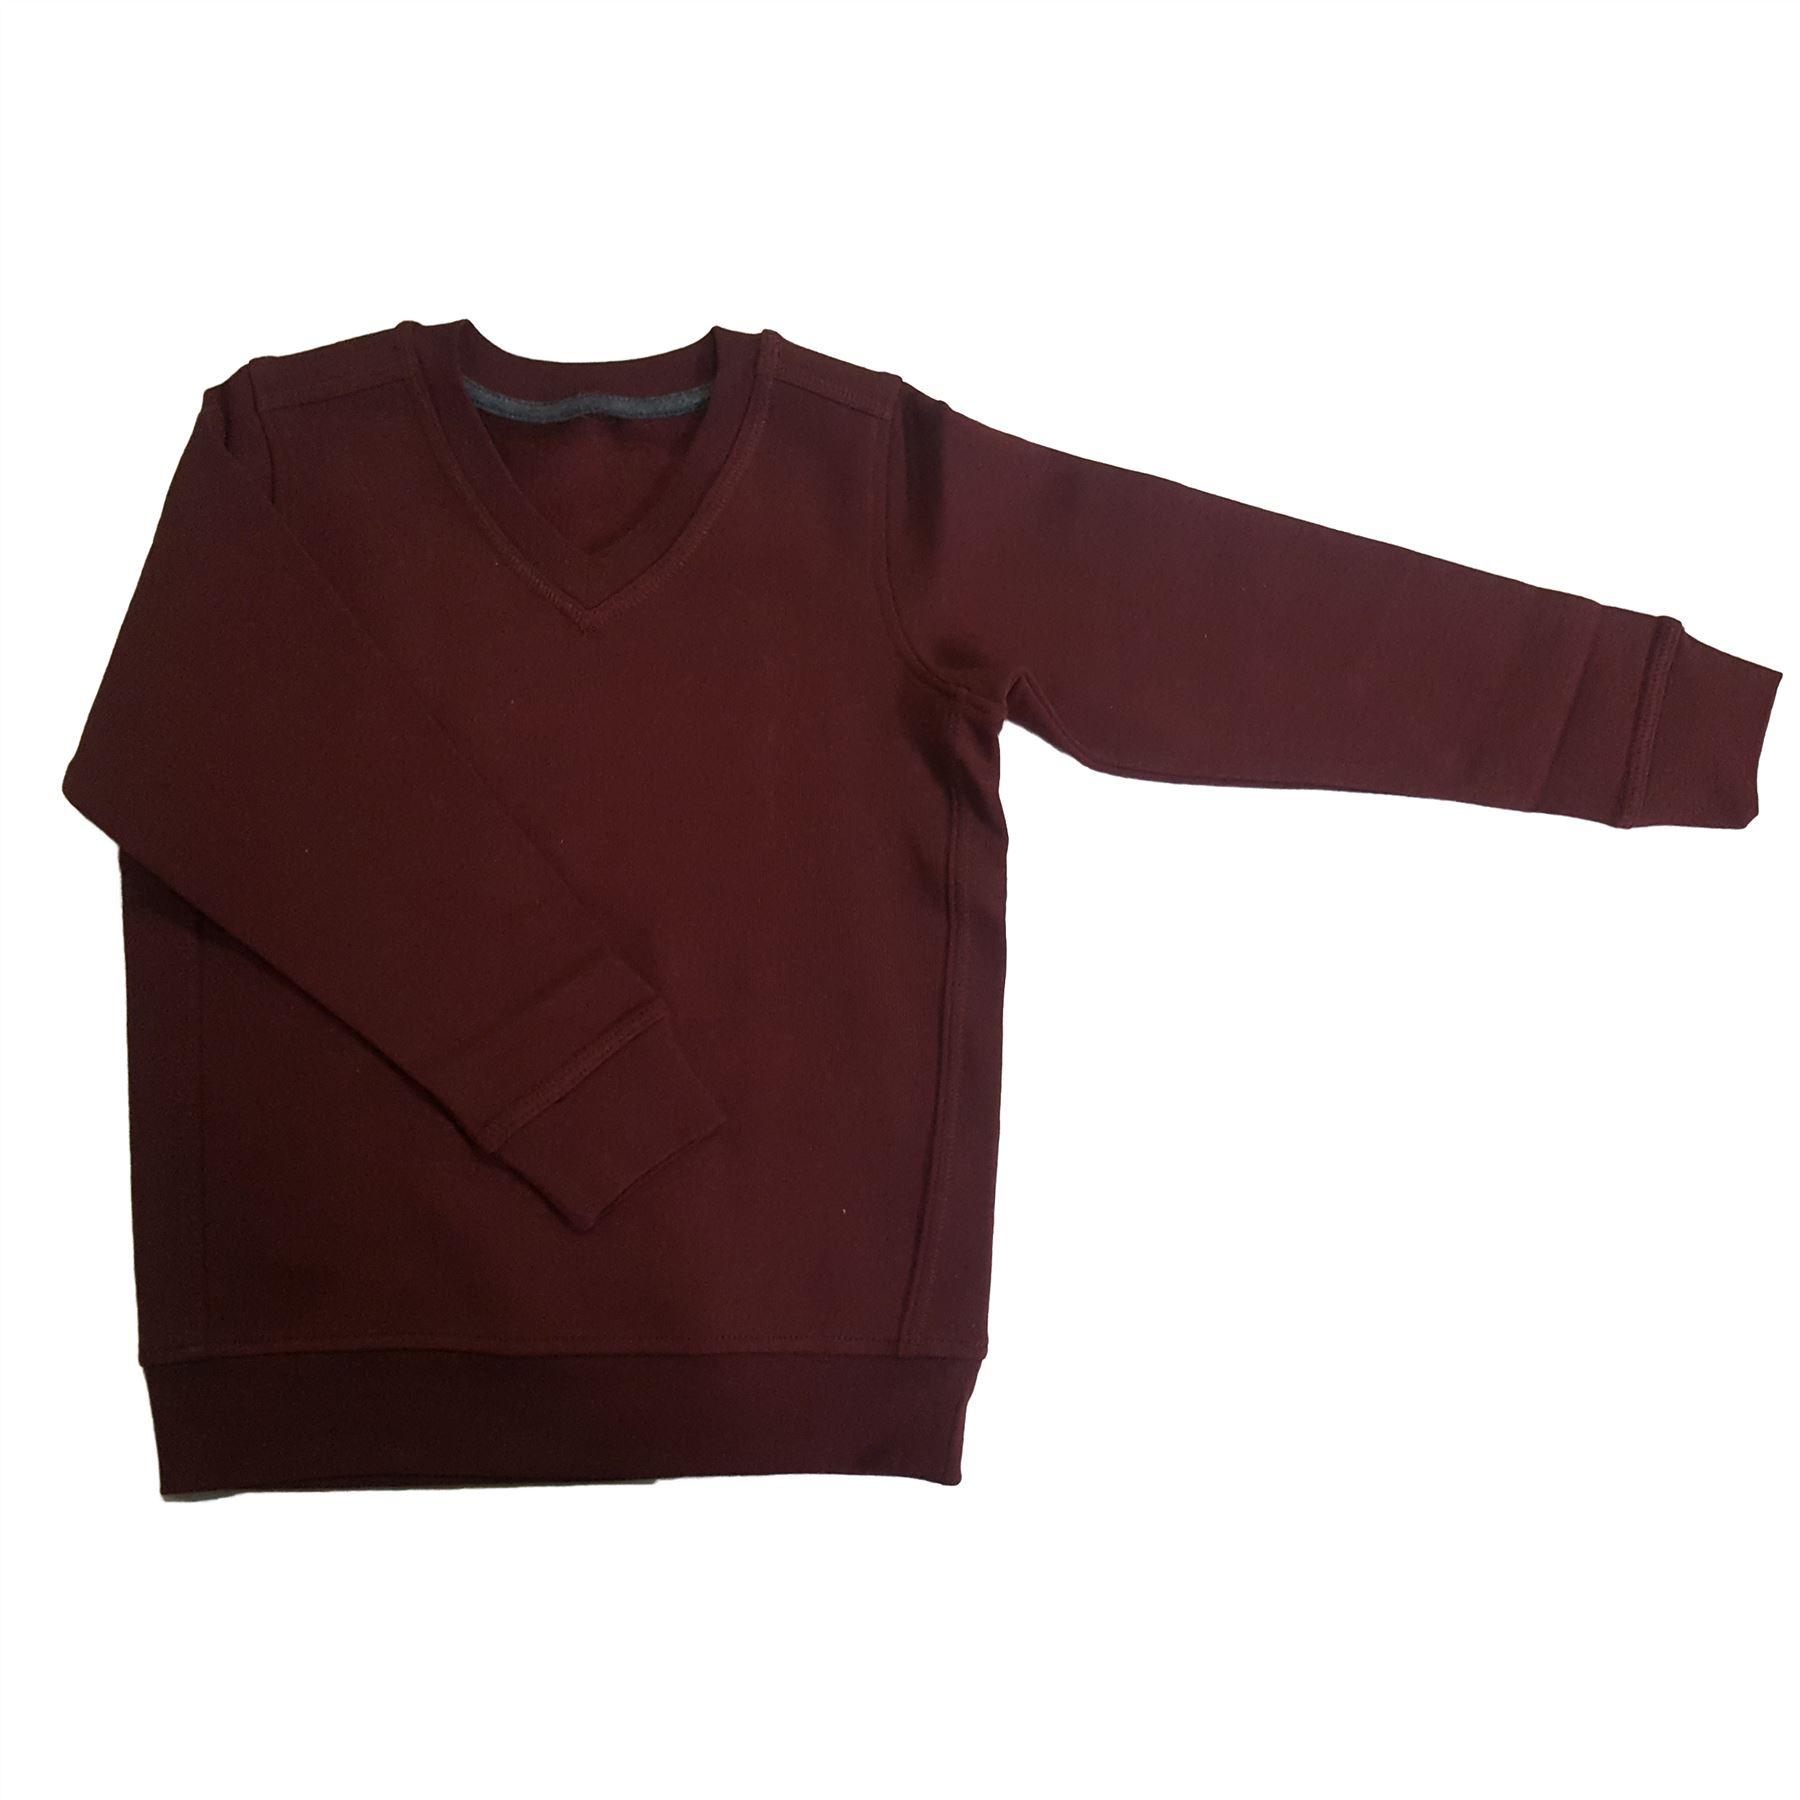 EX M/&S Marks And Spencer Kids Childrens School Uniform V Neck Jumper Sweatshirt